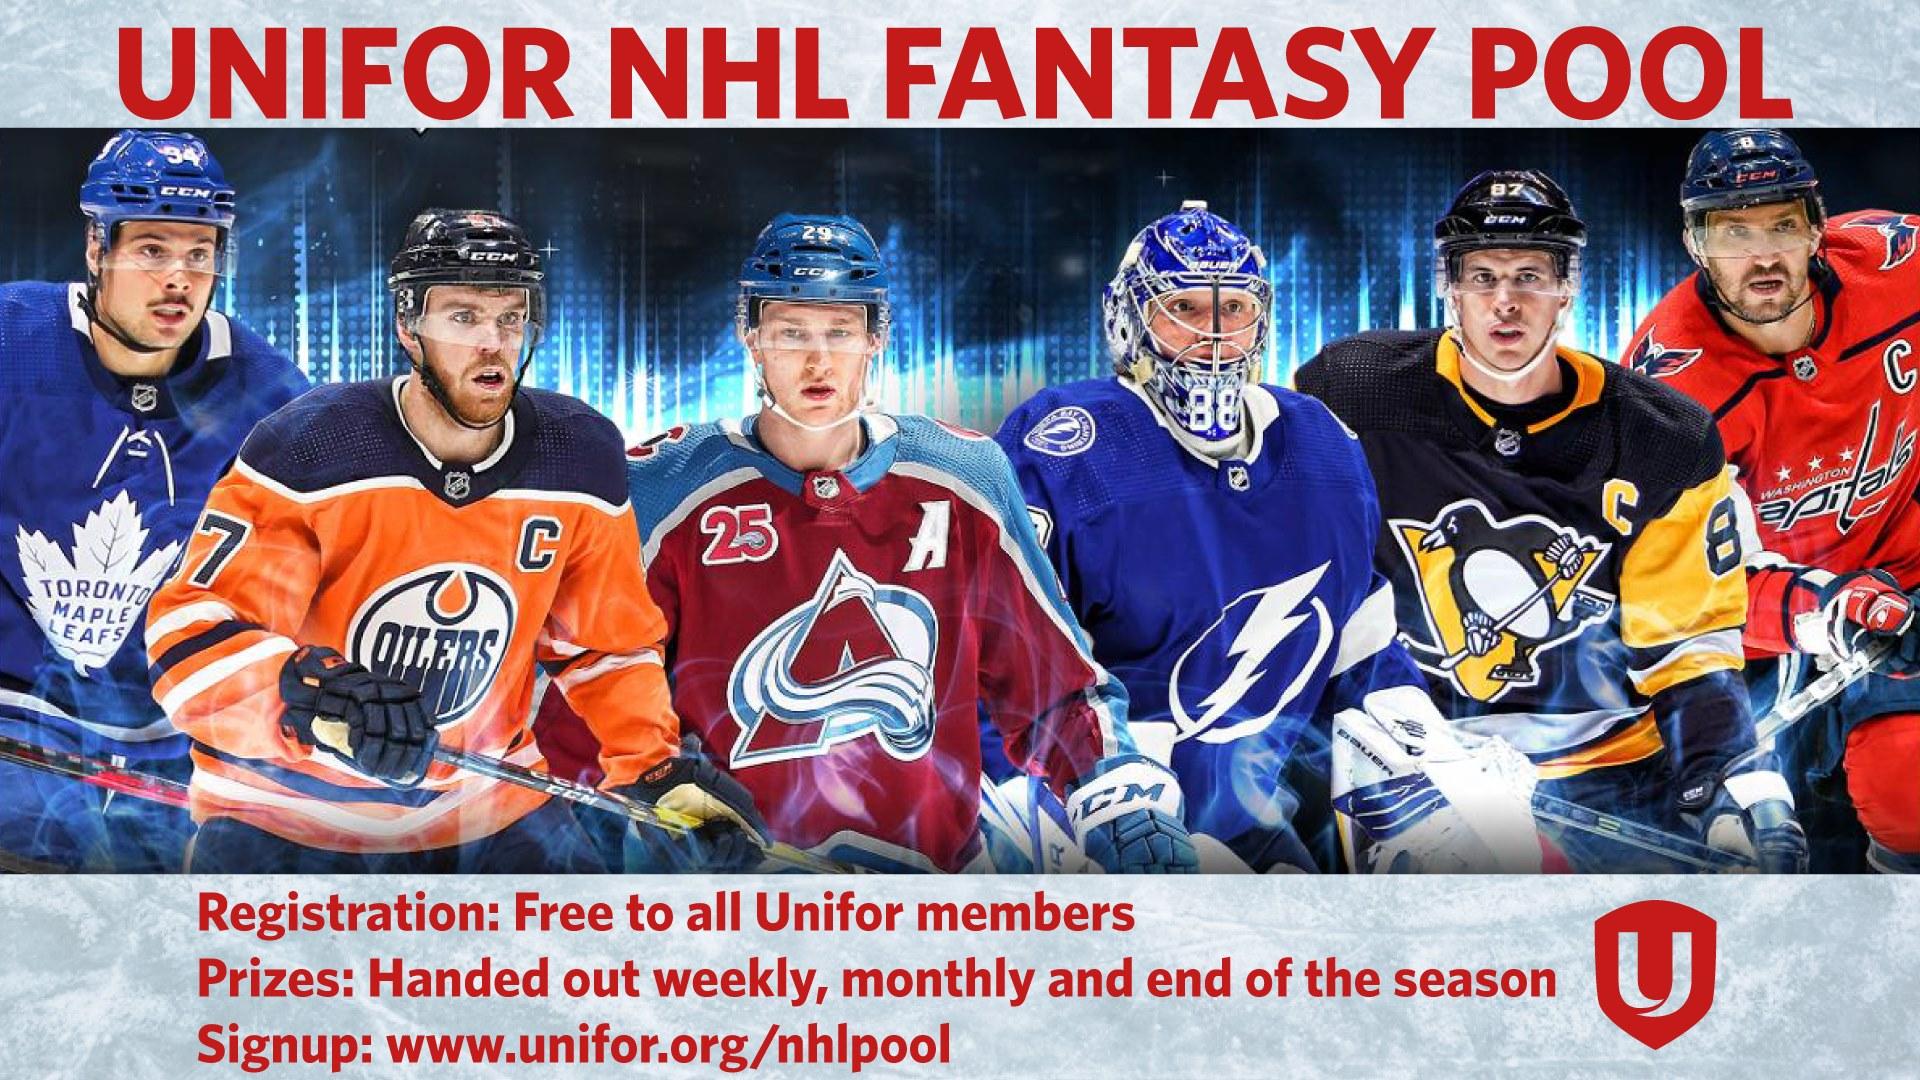 2nd Unifor NHL Fantasy Hockey Pool